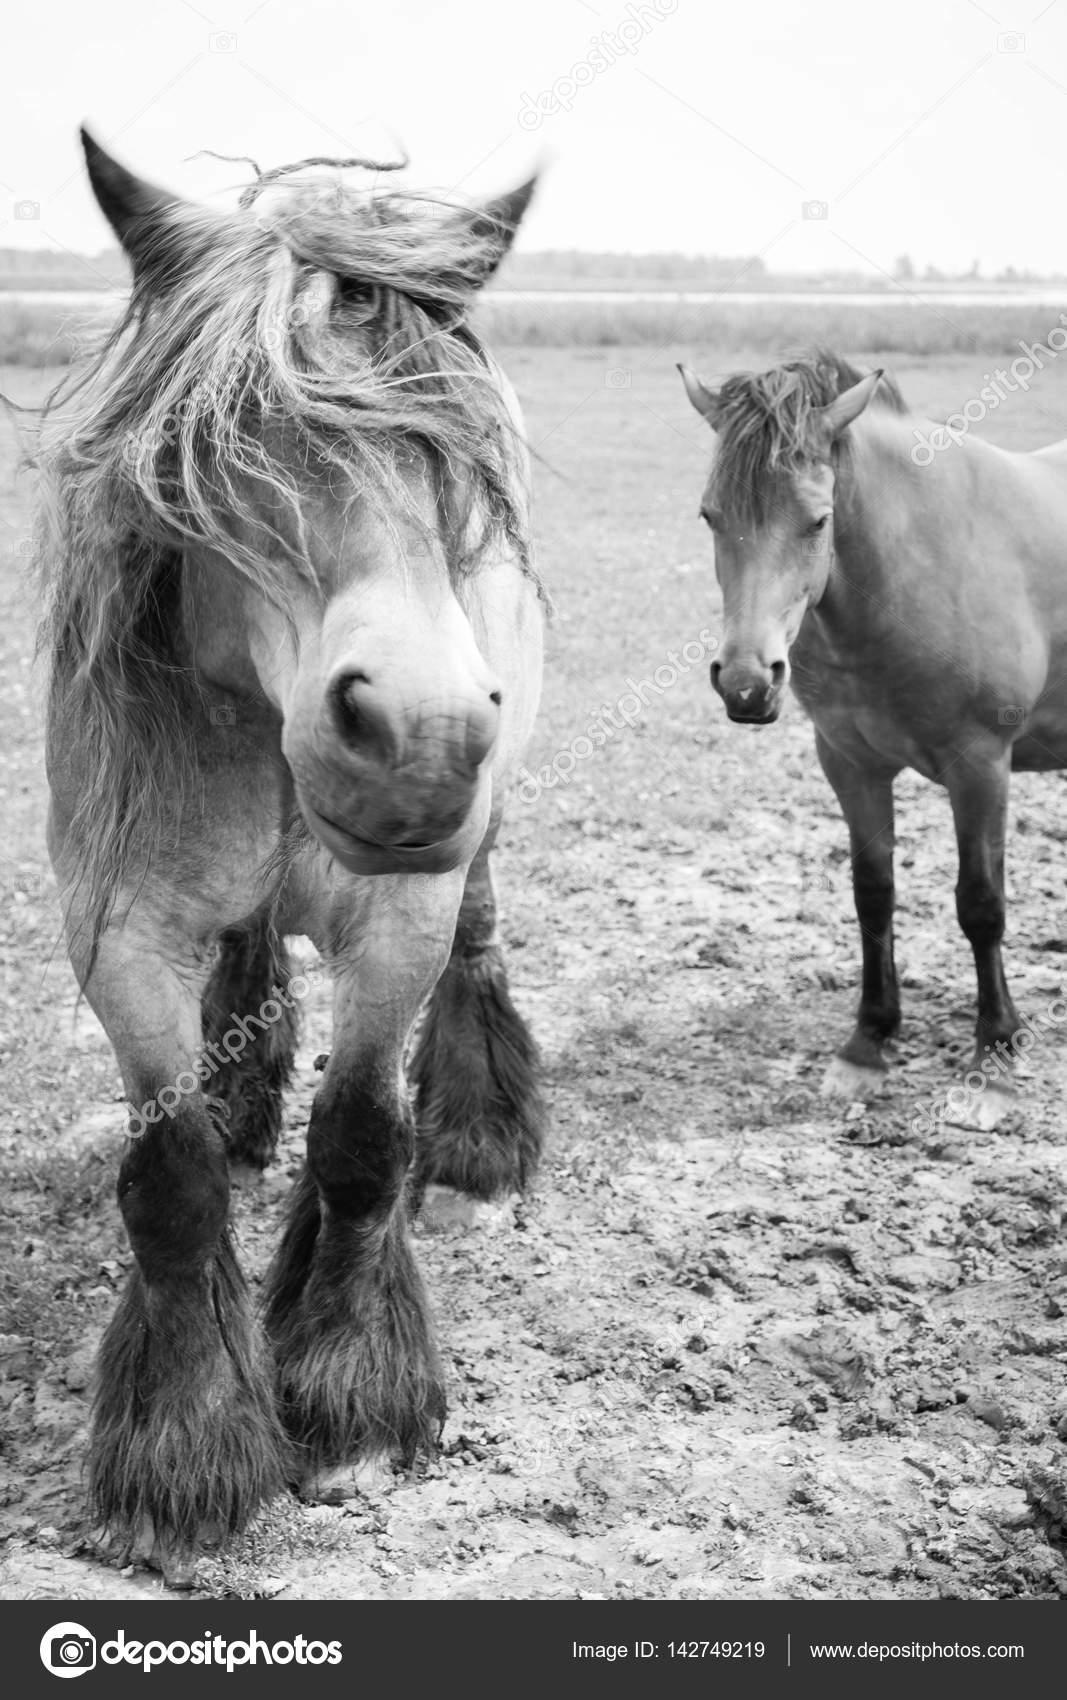 Photos Black And White Wild Horses Black And White Picture Of European Wild Horses Stock Photo C Bjorn999 142749219